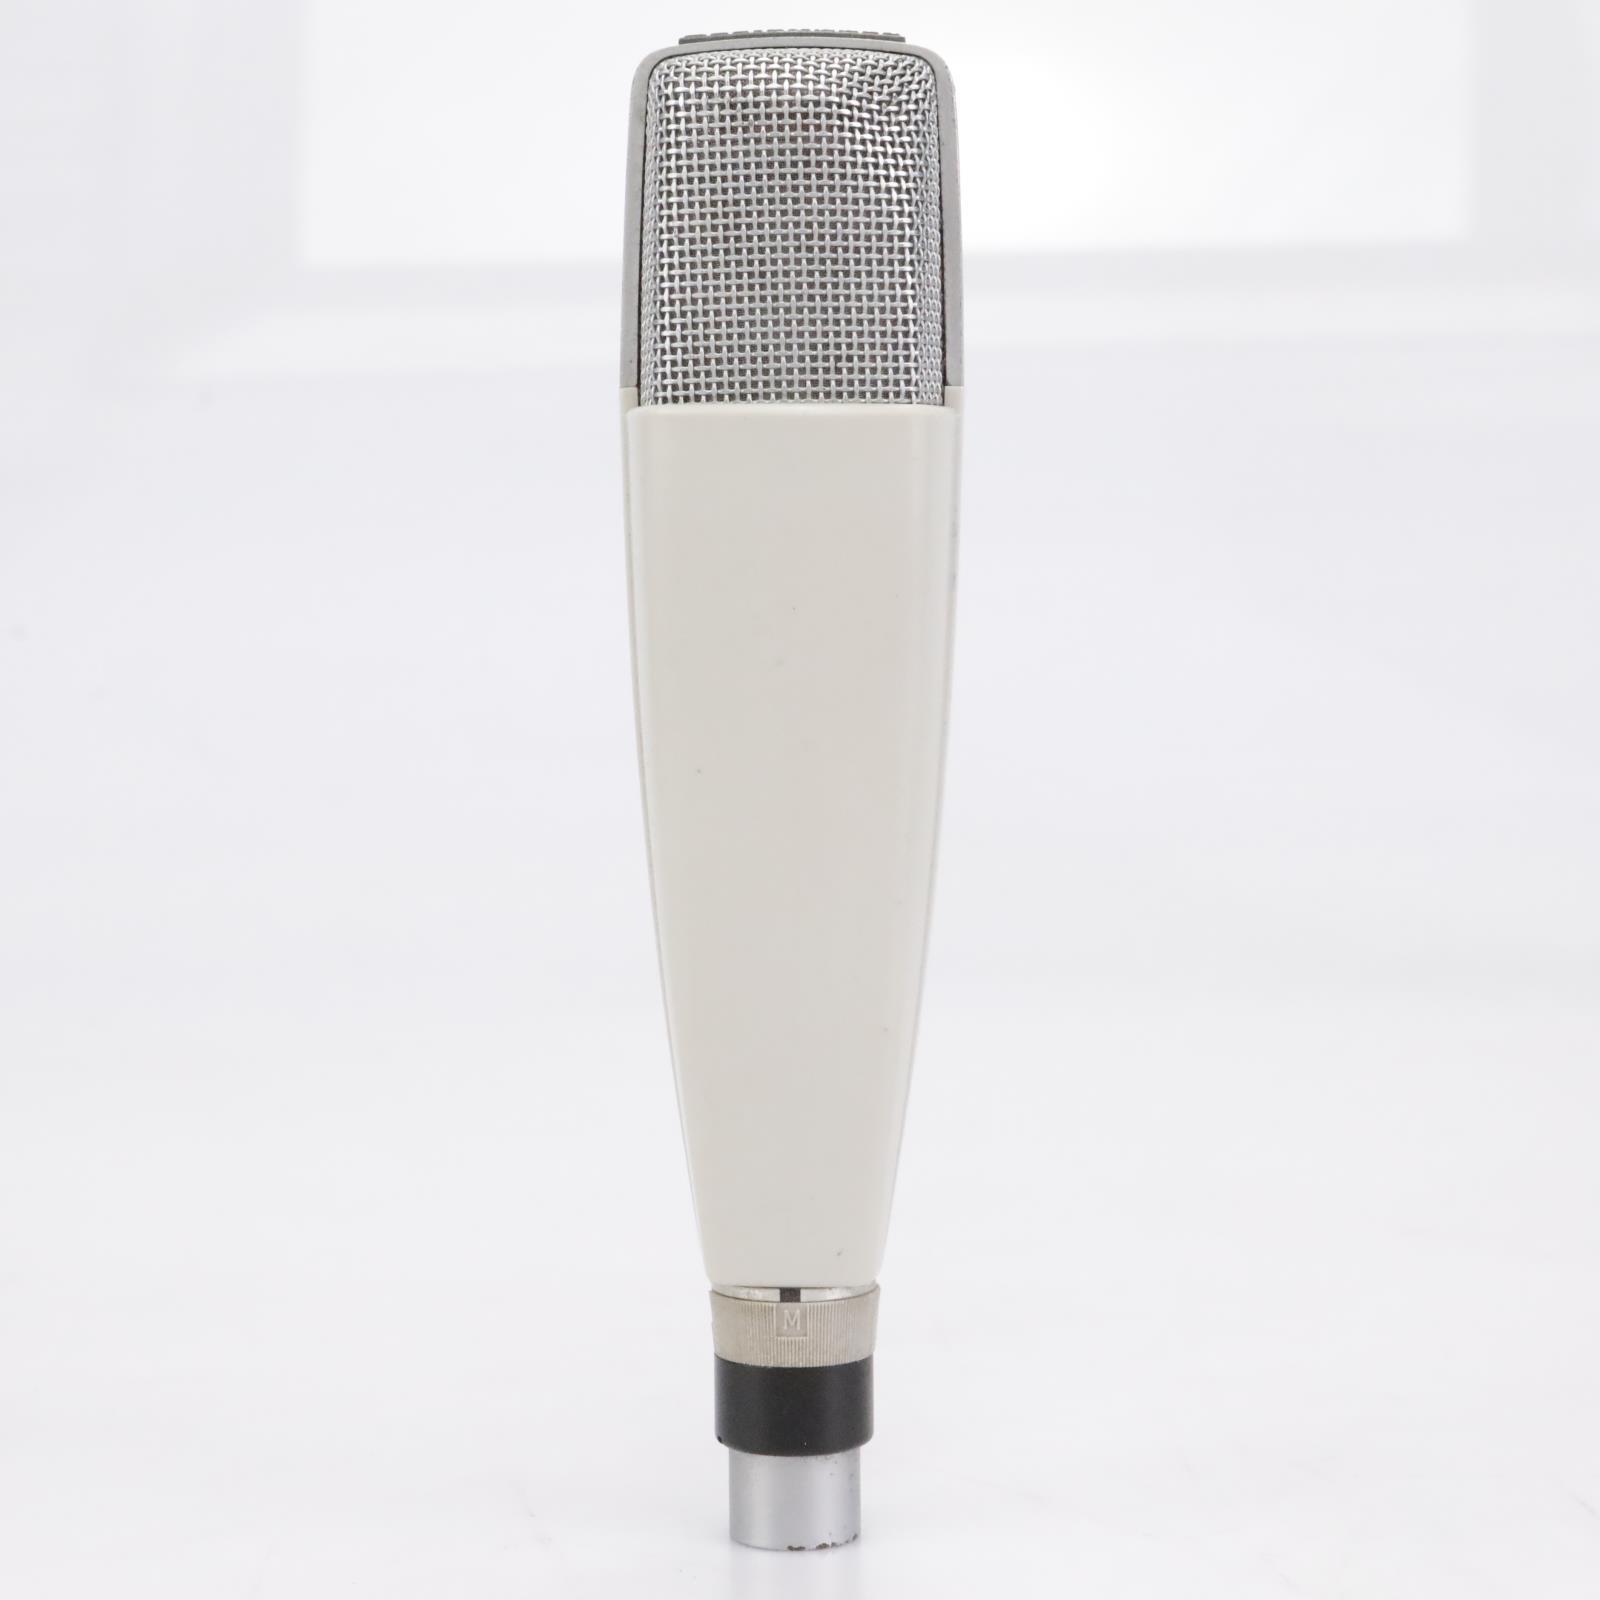 Sennheiser MD421-HL Vintage Dynamic Mic Microphone #43608